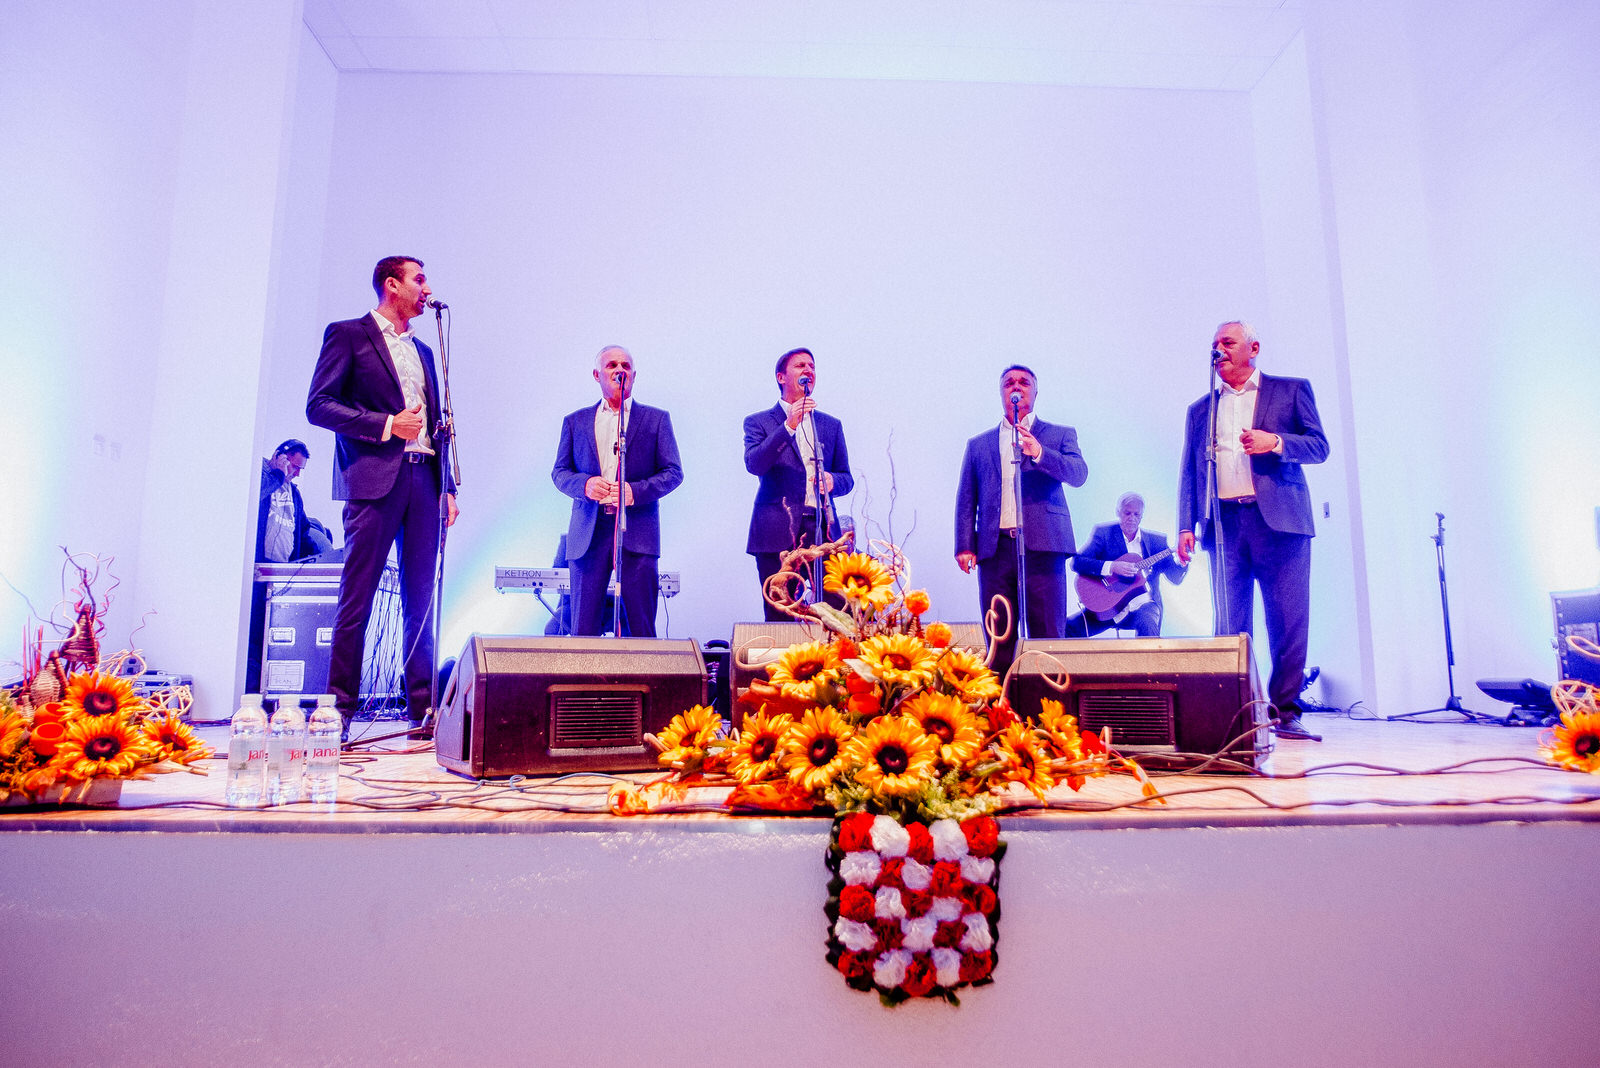 likaclub_korenica_klapa-intrade_dan-neovisnosti_2019-9